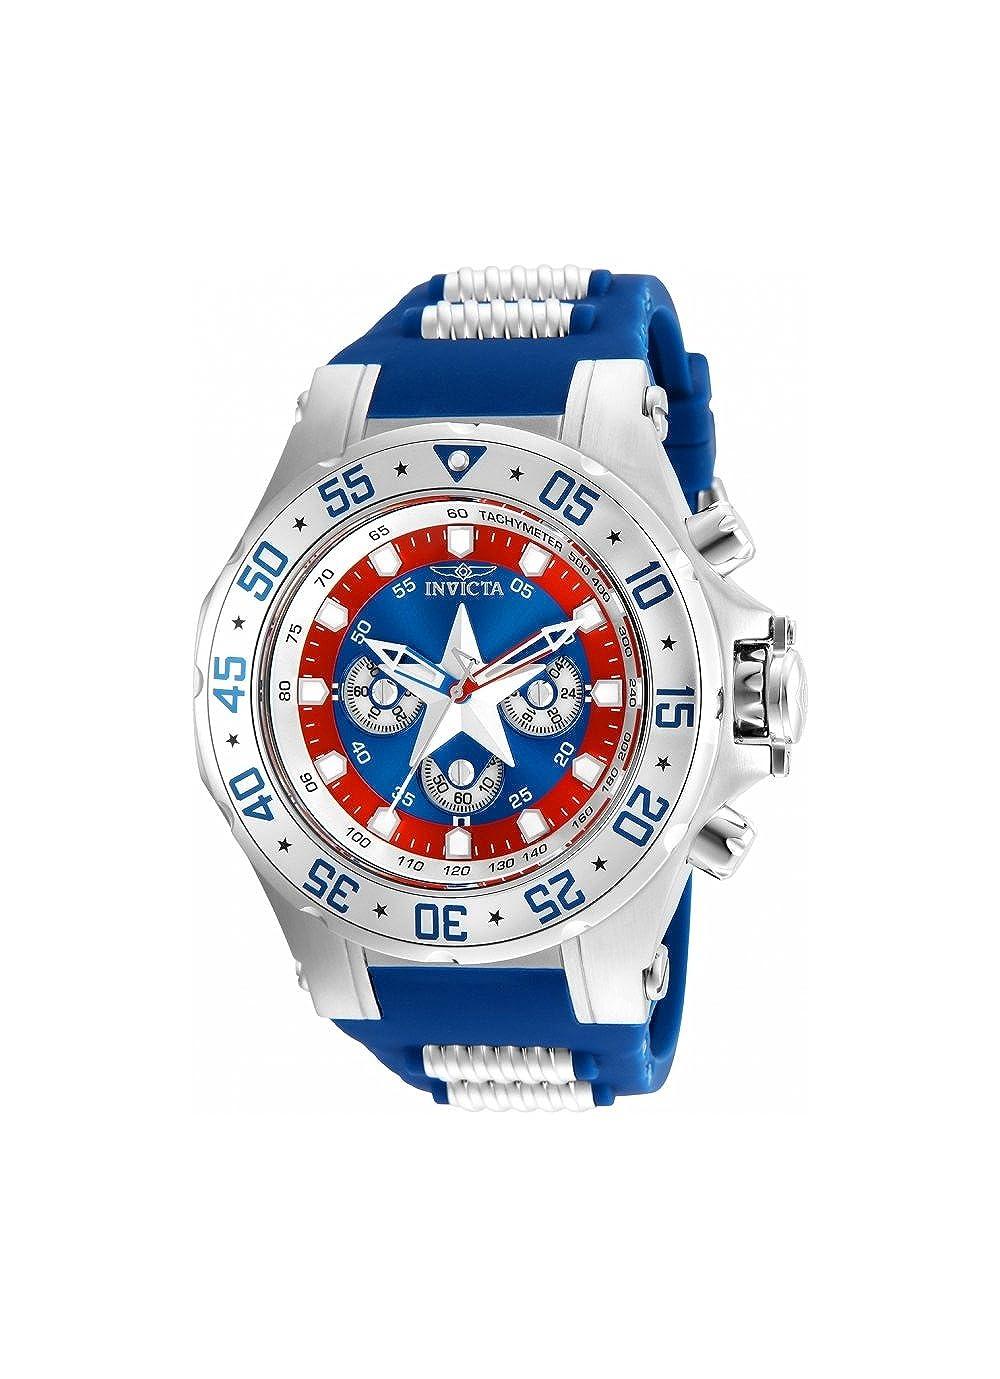 Invicta Men 's 25685 Marvelクオーツクロノグラフブルーダイヤル腕時計 B07DX63ZS6